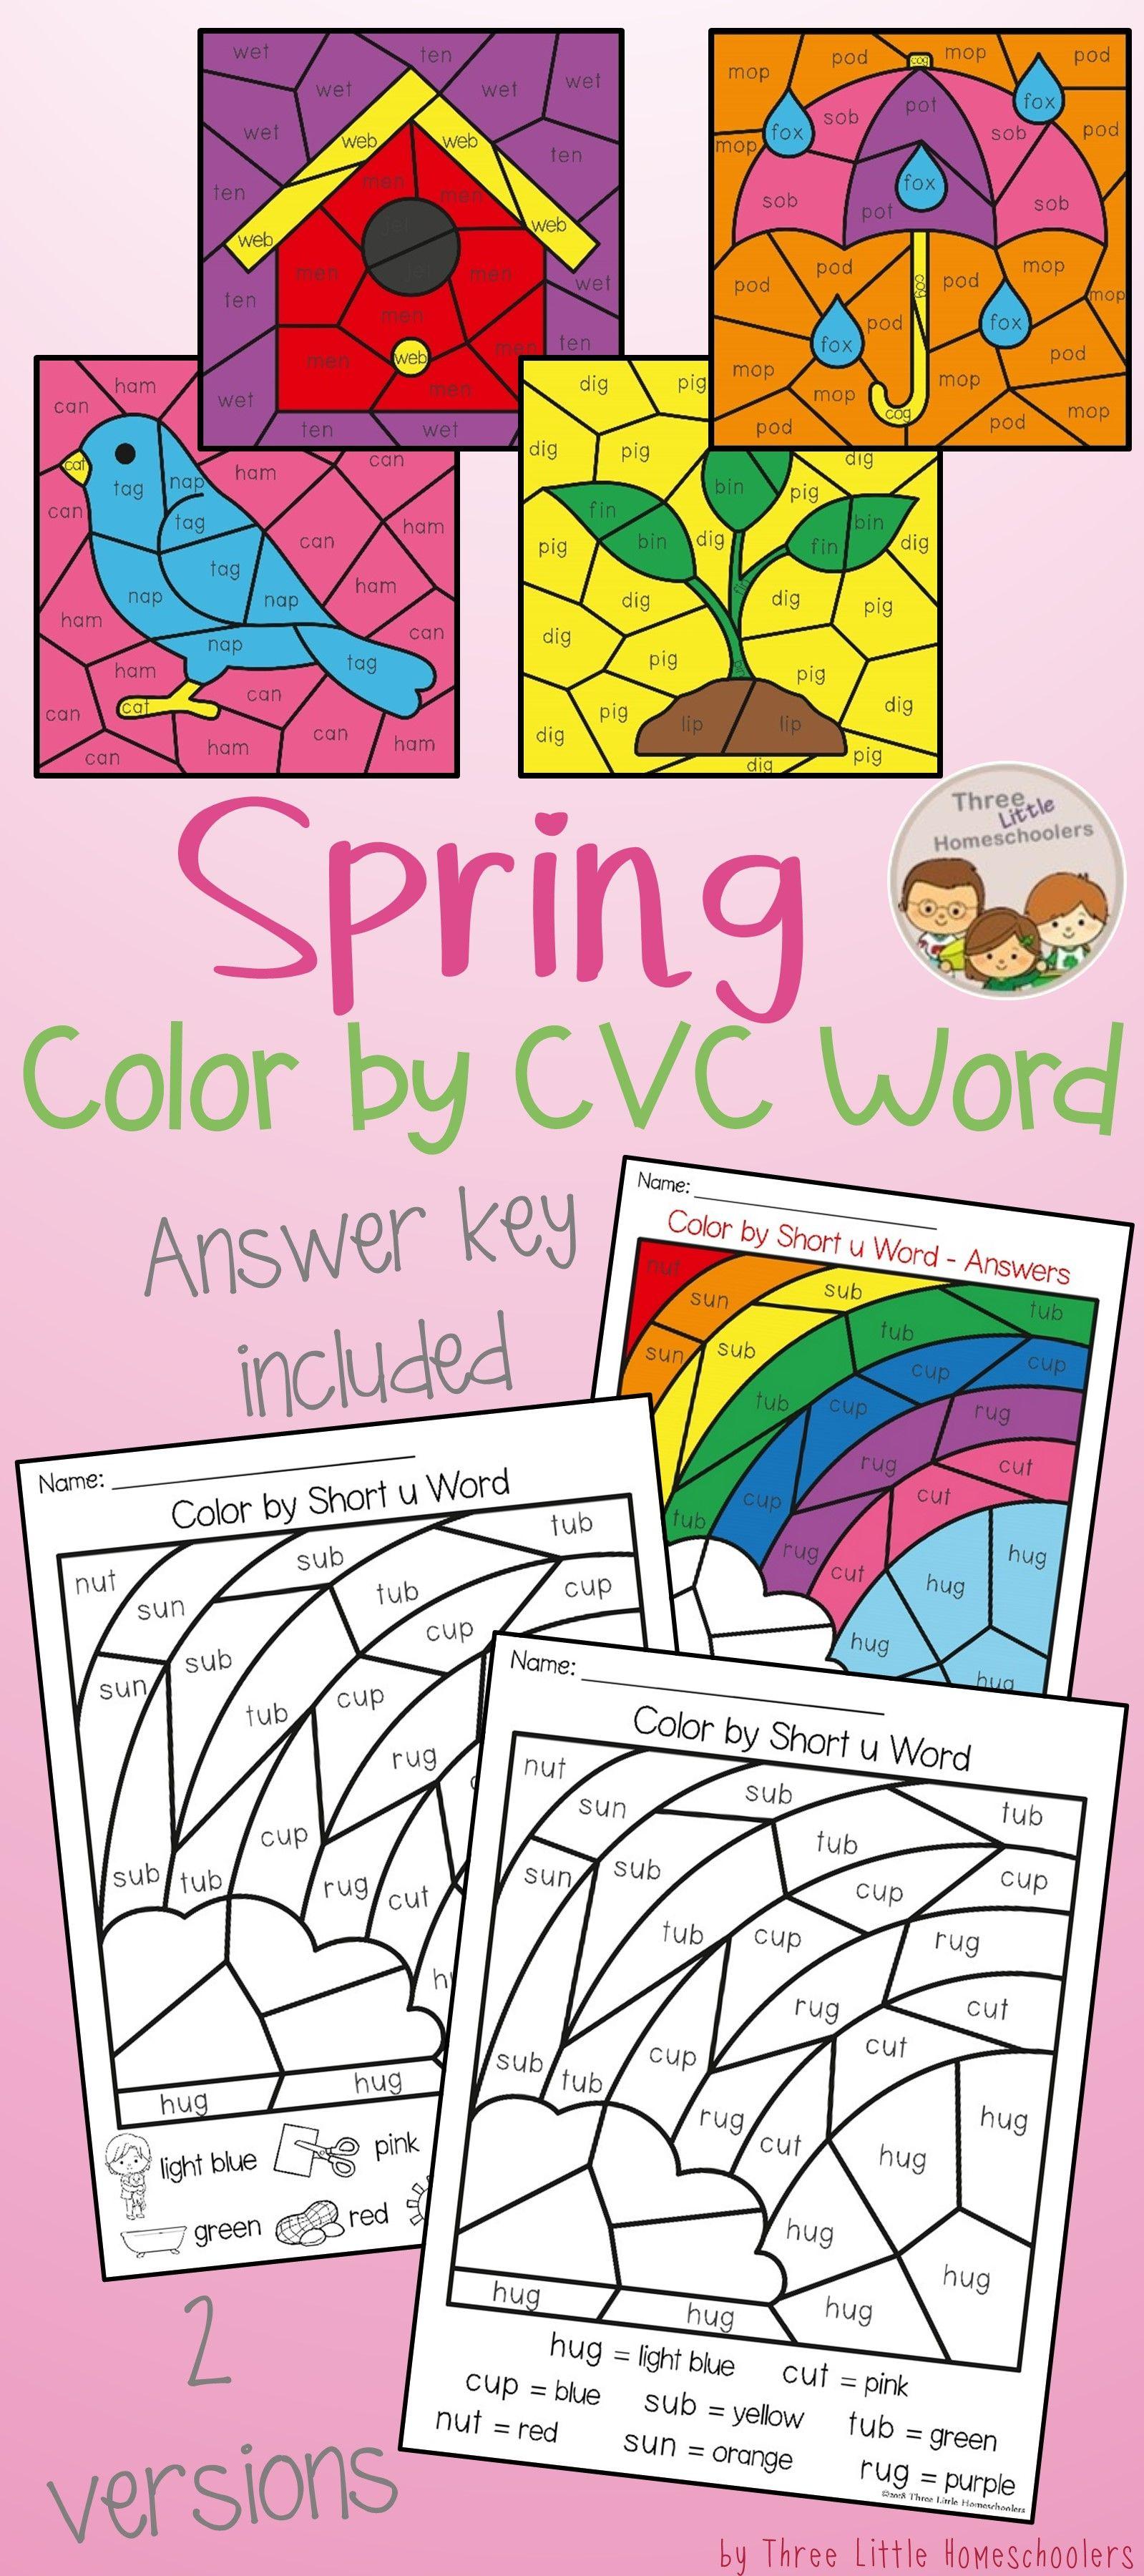 Spring Color by CVC Word | Pinterest | Homeschool worksheets ...